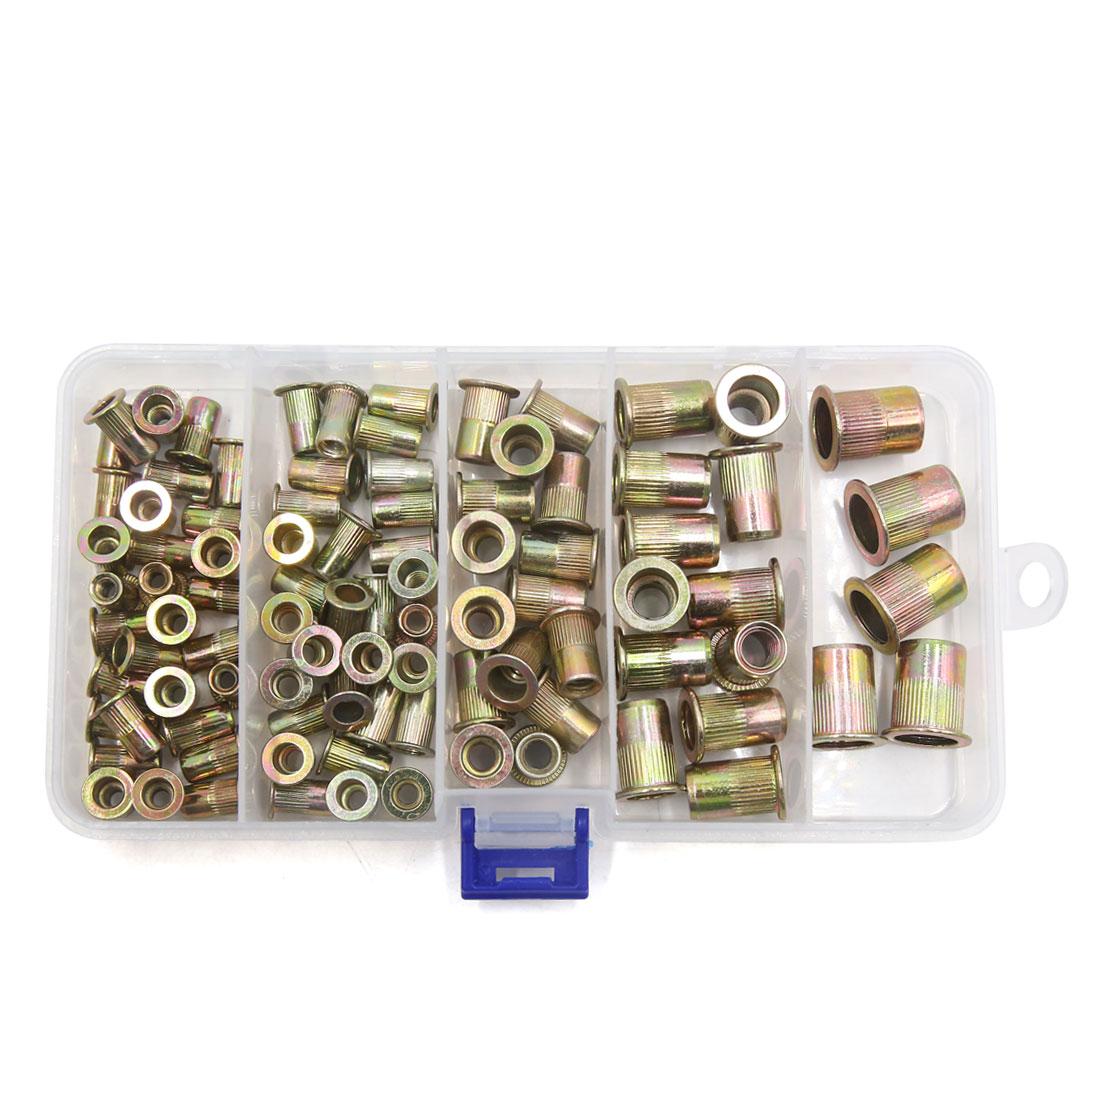 92Pcs Mixed Zinc Plated Carbon Steel Car Rivet Nut Flat Head Insert Nutsert Kit - image 2 of 4